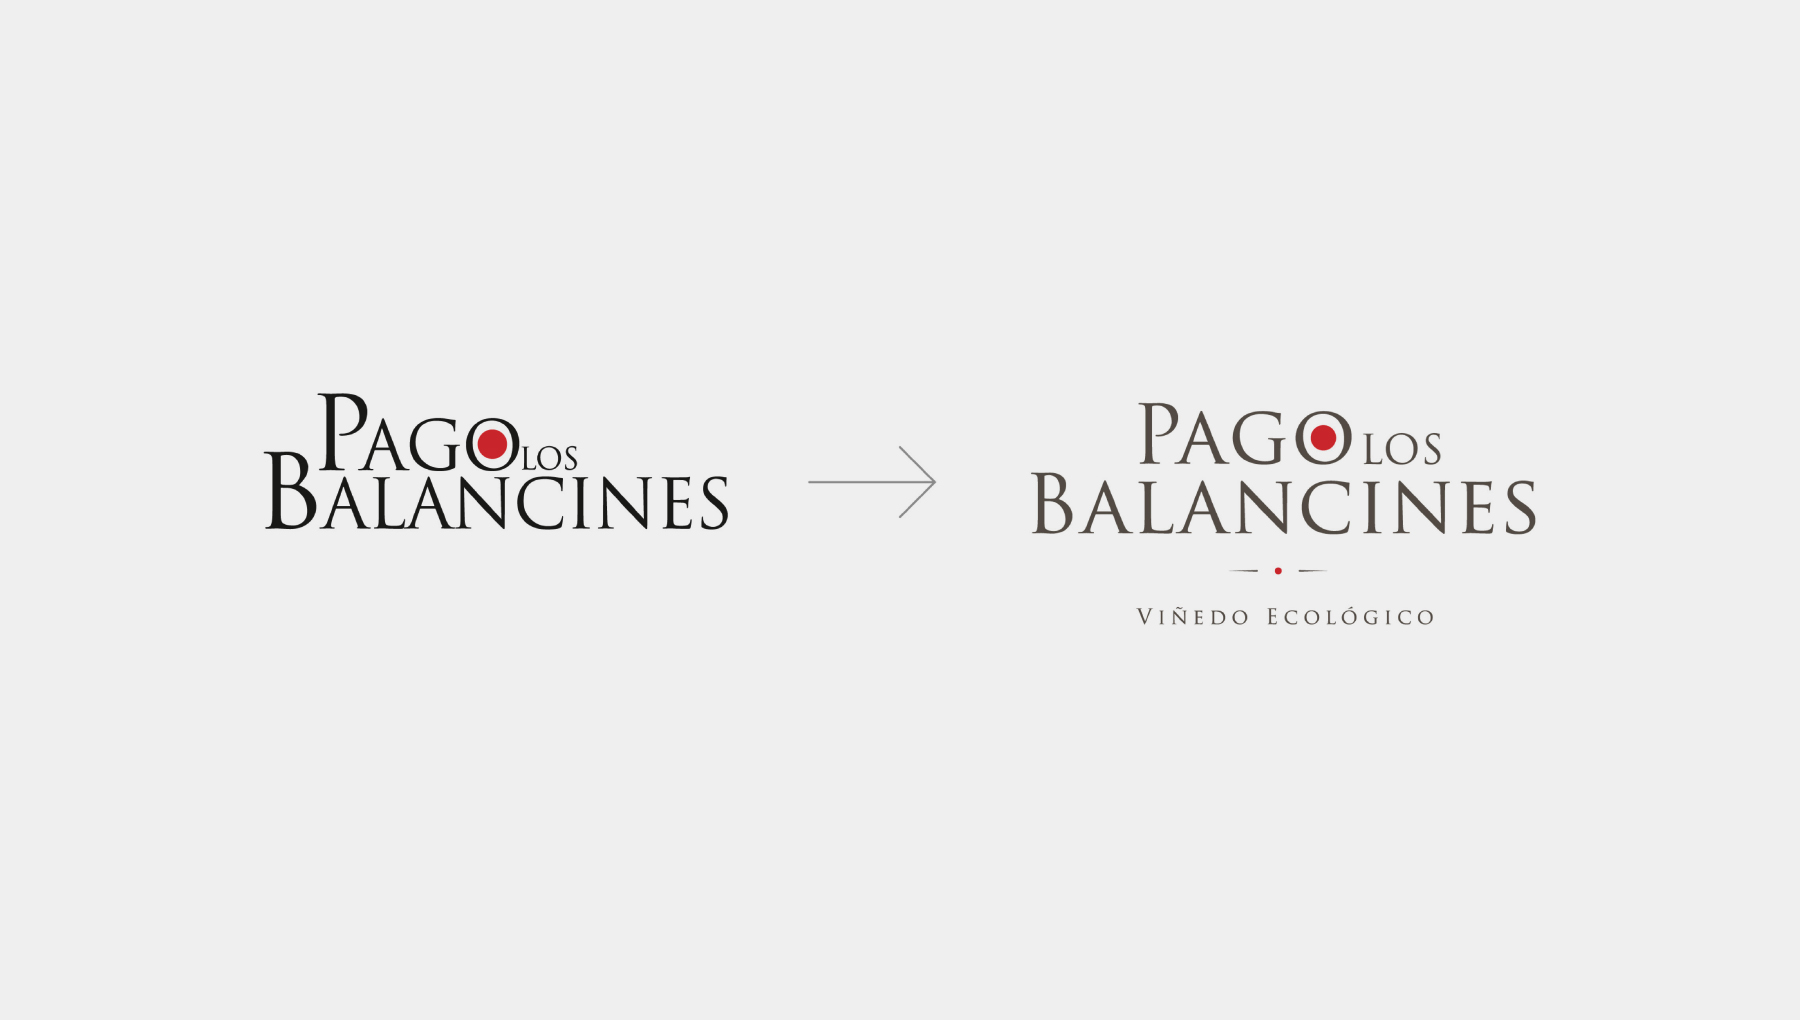 logo evolucion y branding para bodega